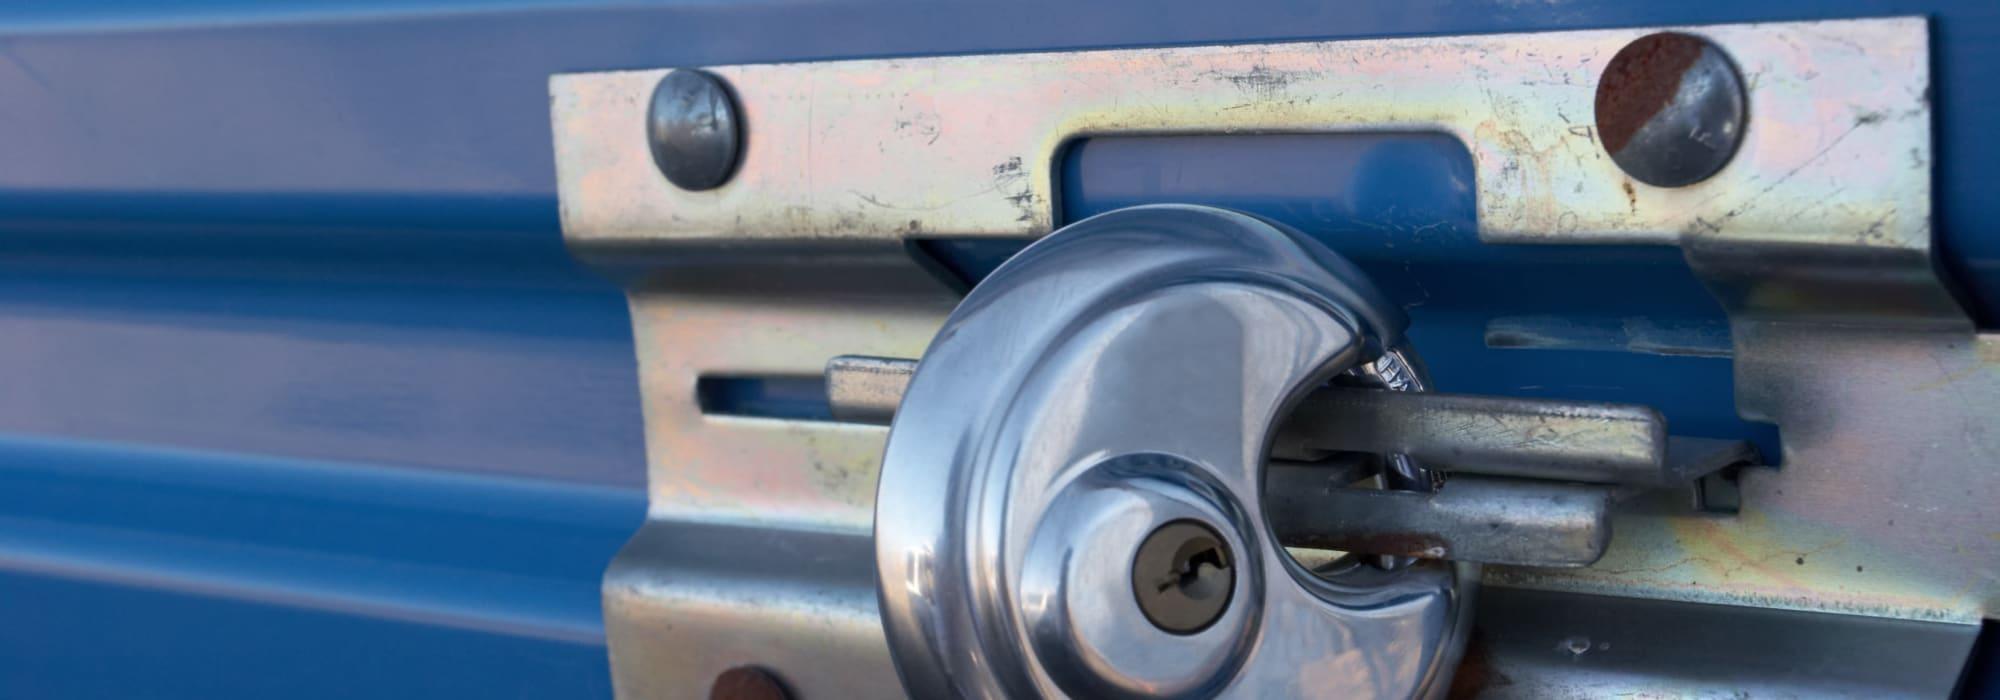 Lock on storage unit at Self Storage Plus in Springfield, Virginia